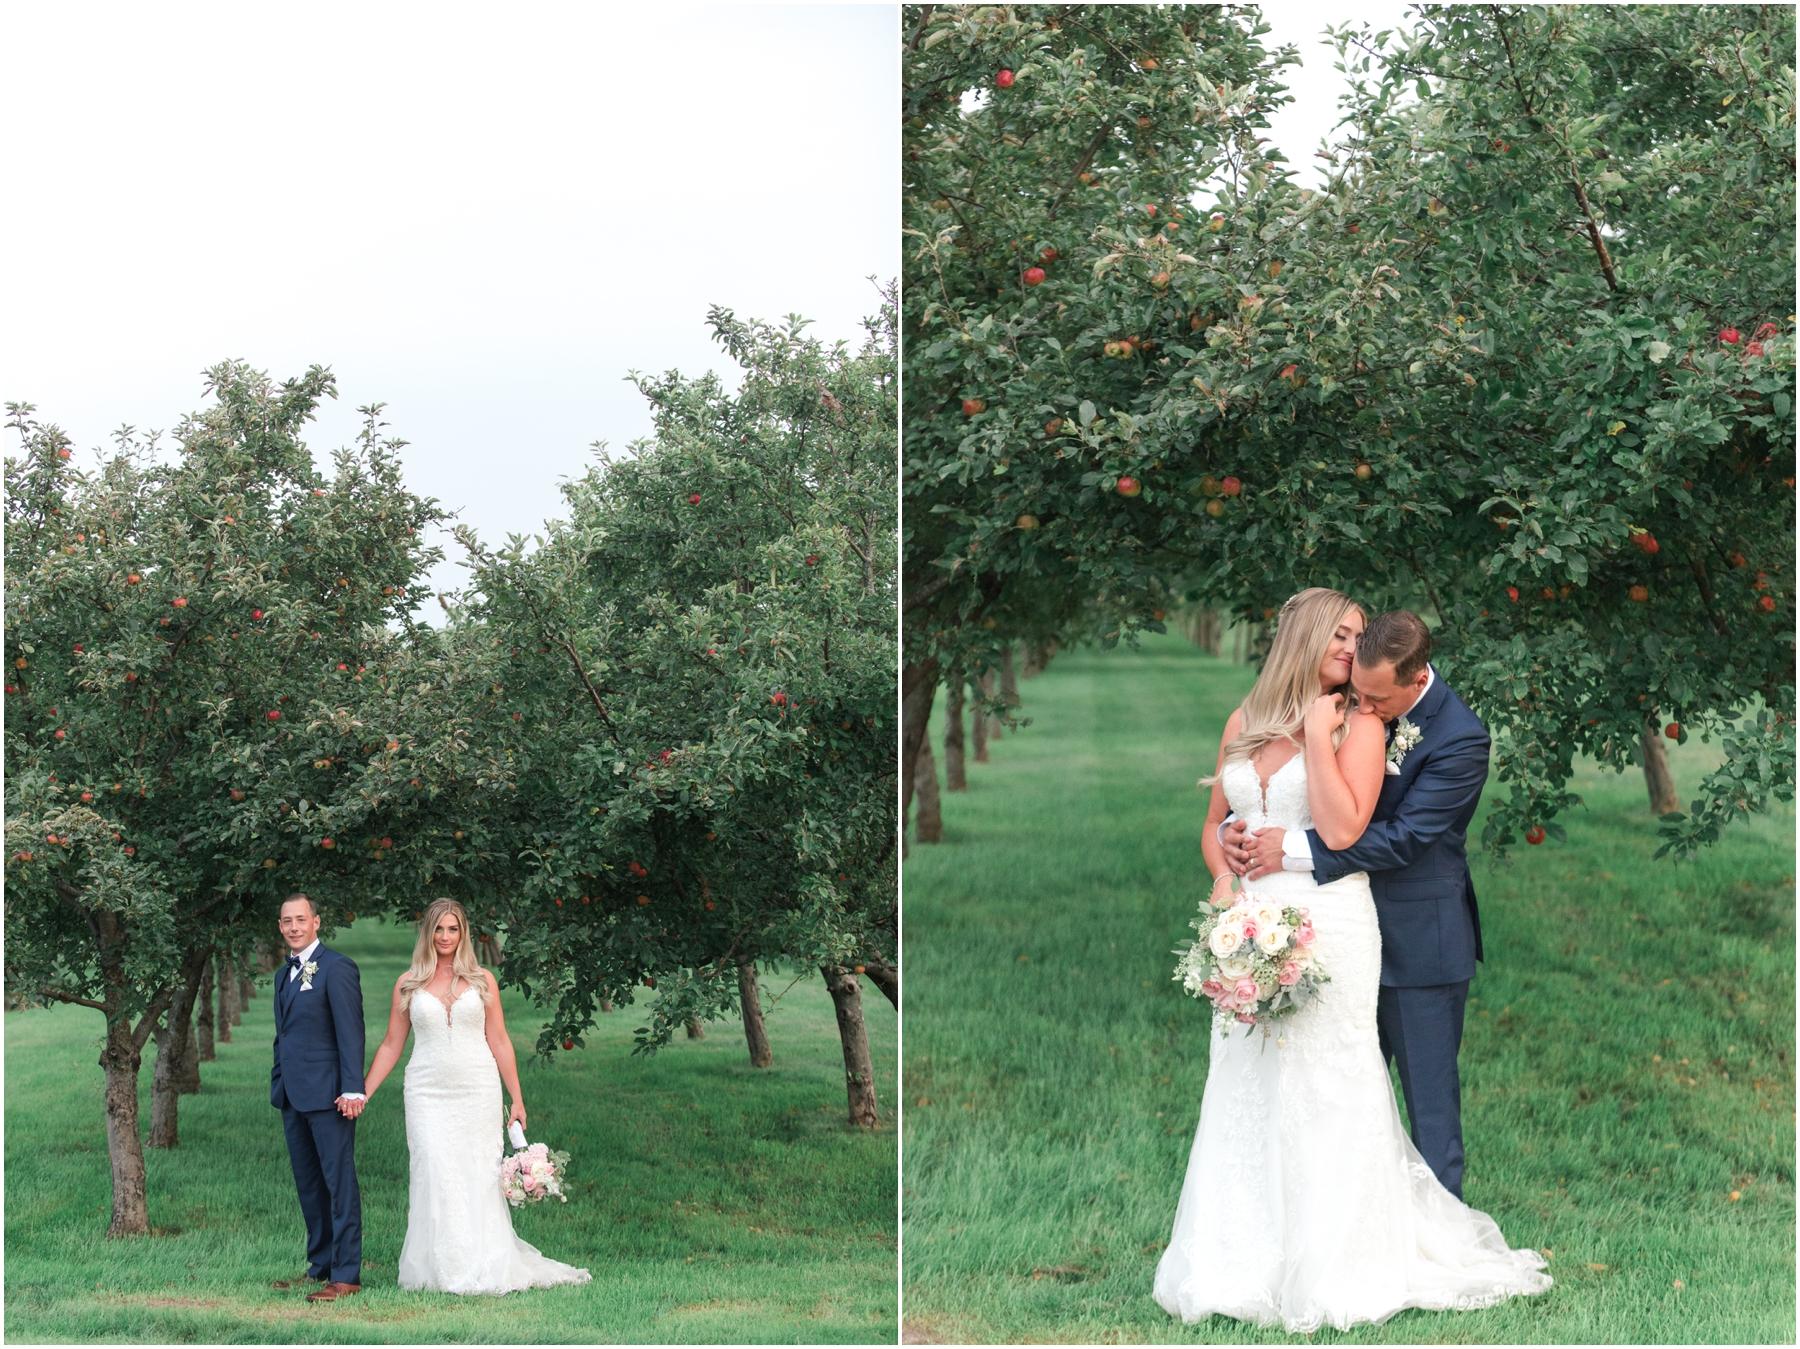 Bloom Field Gardens Wedding Precious Photography Katherine & Chris_090